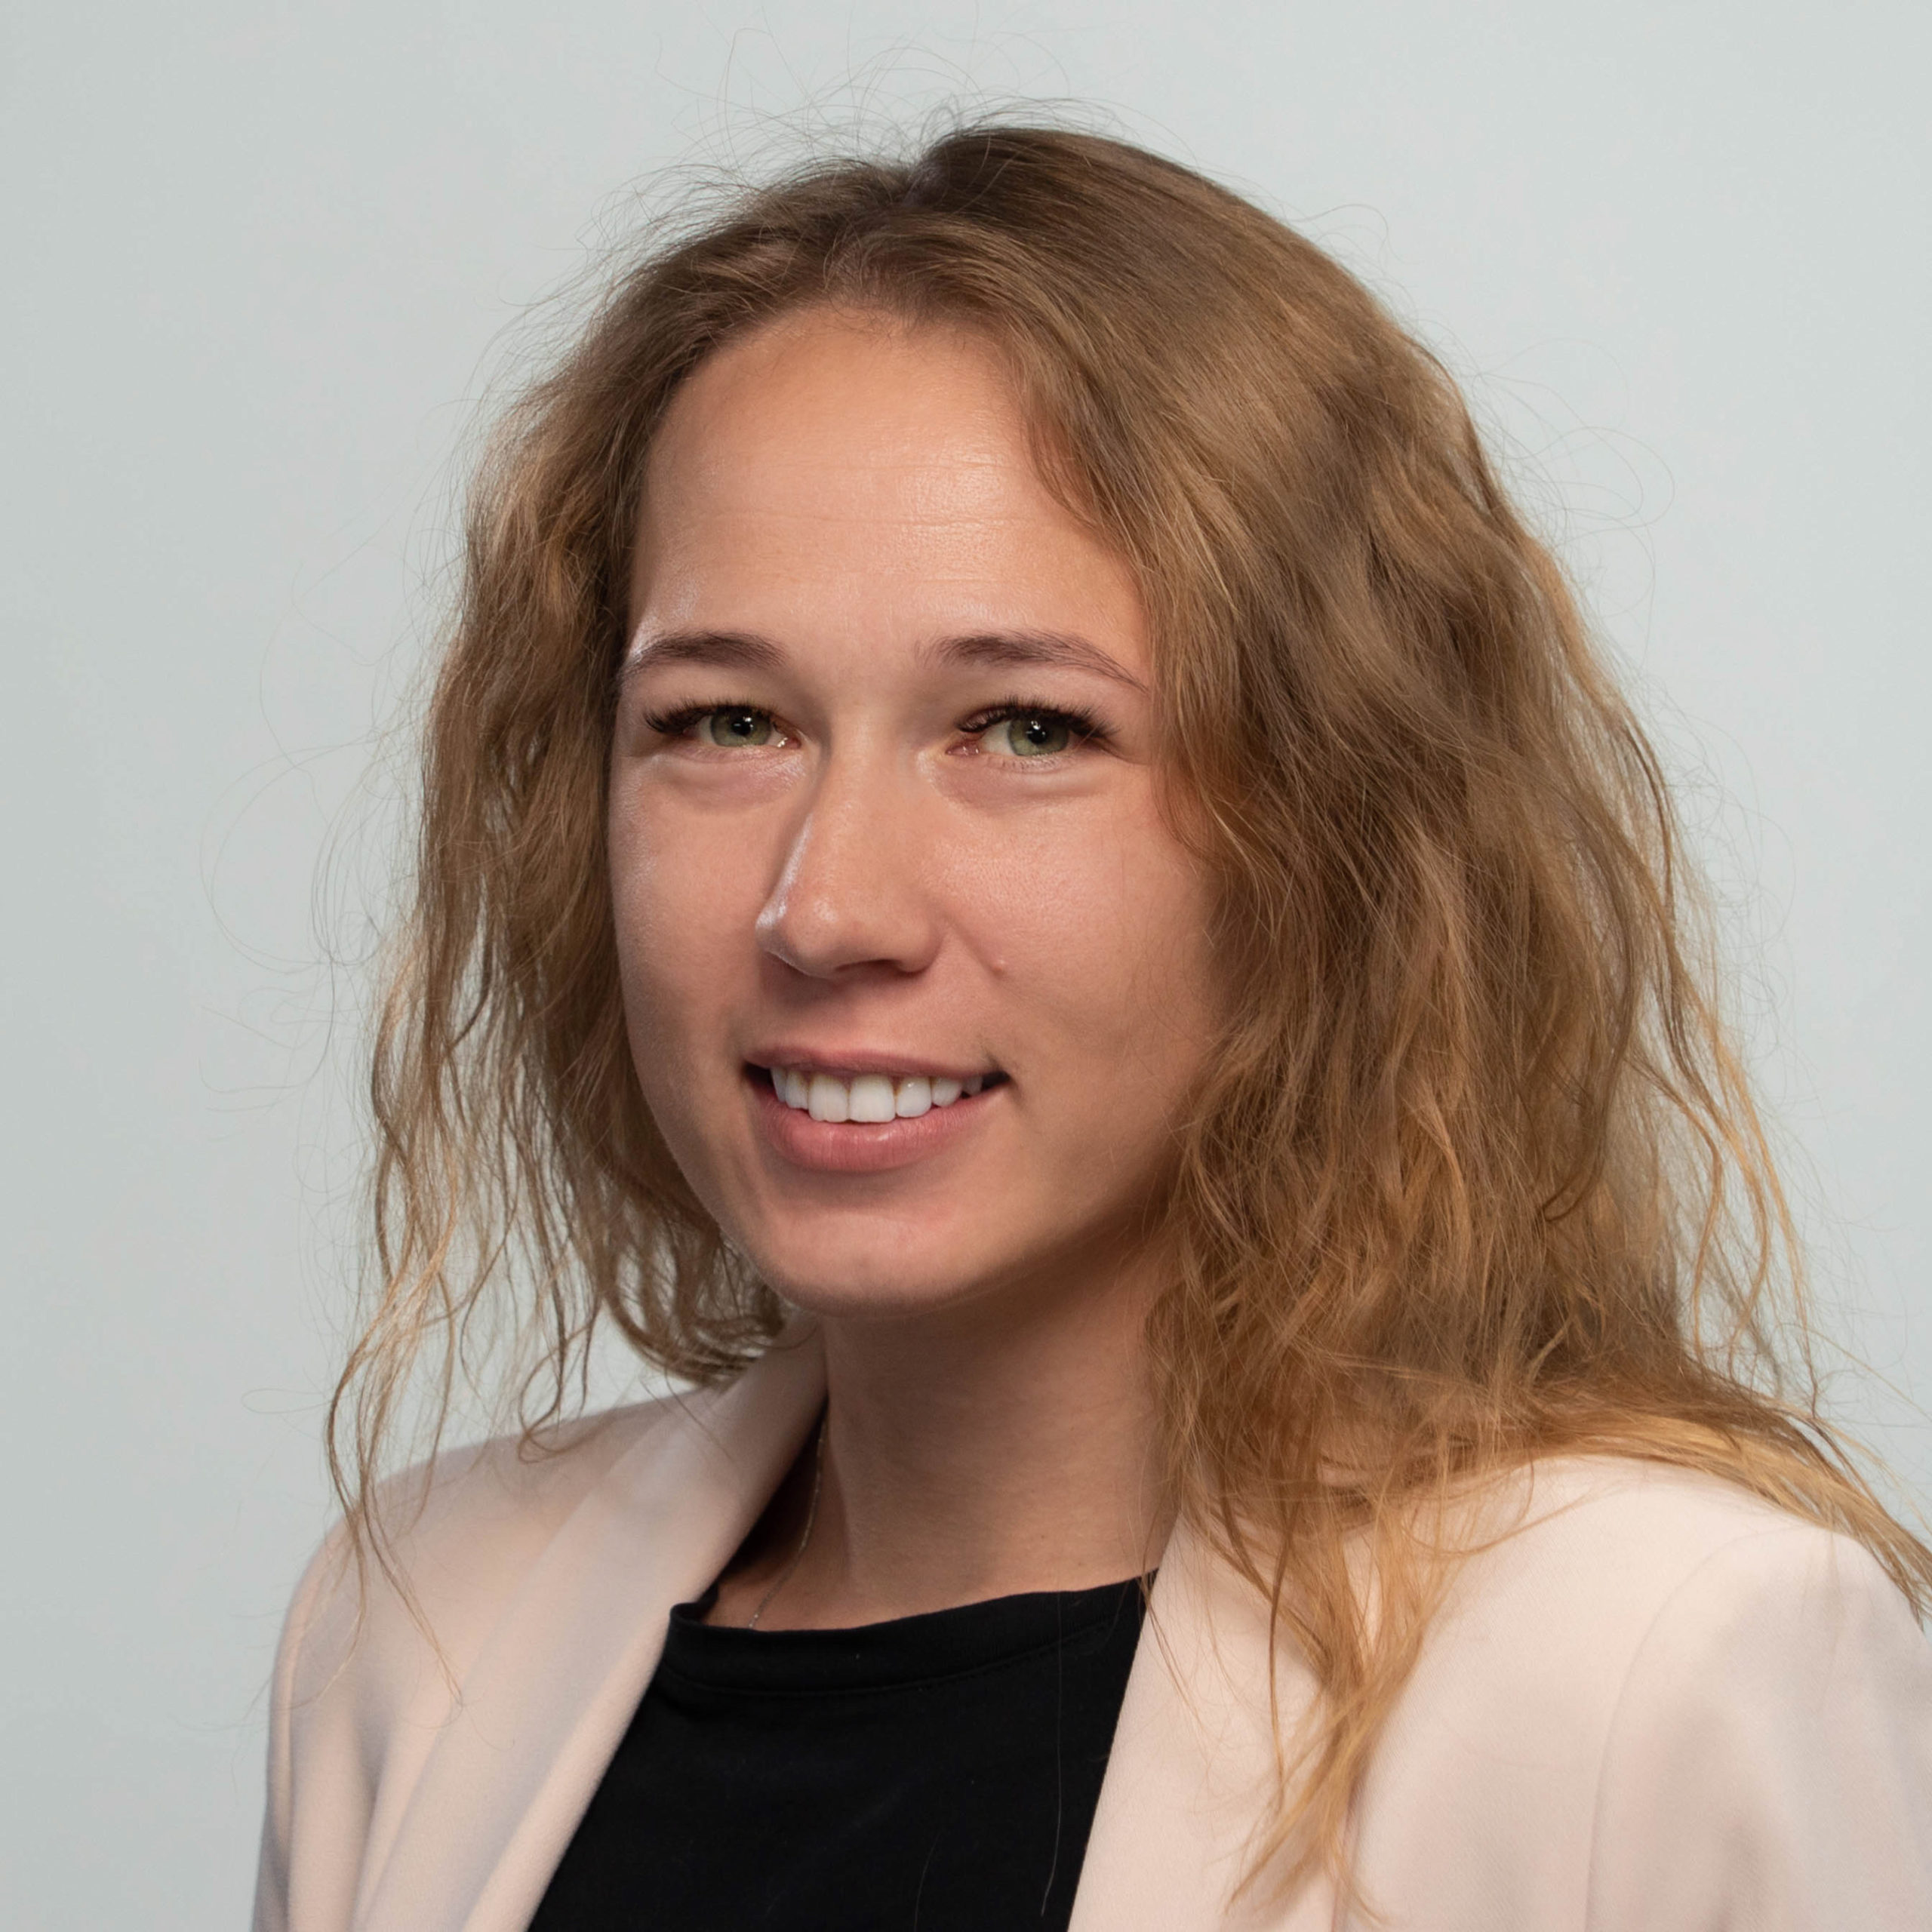 Макарова Александра Викторовна МГПУ